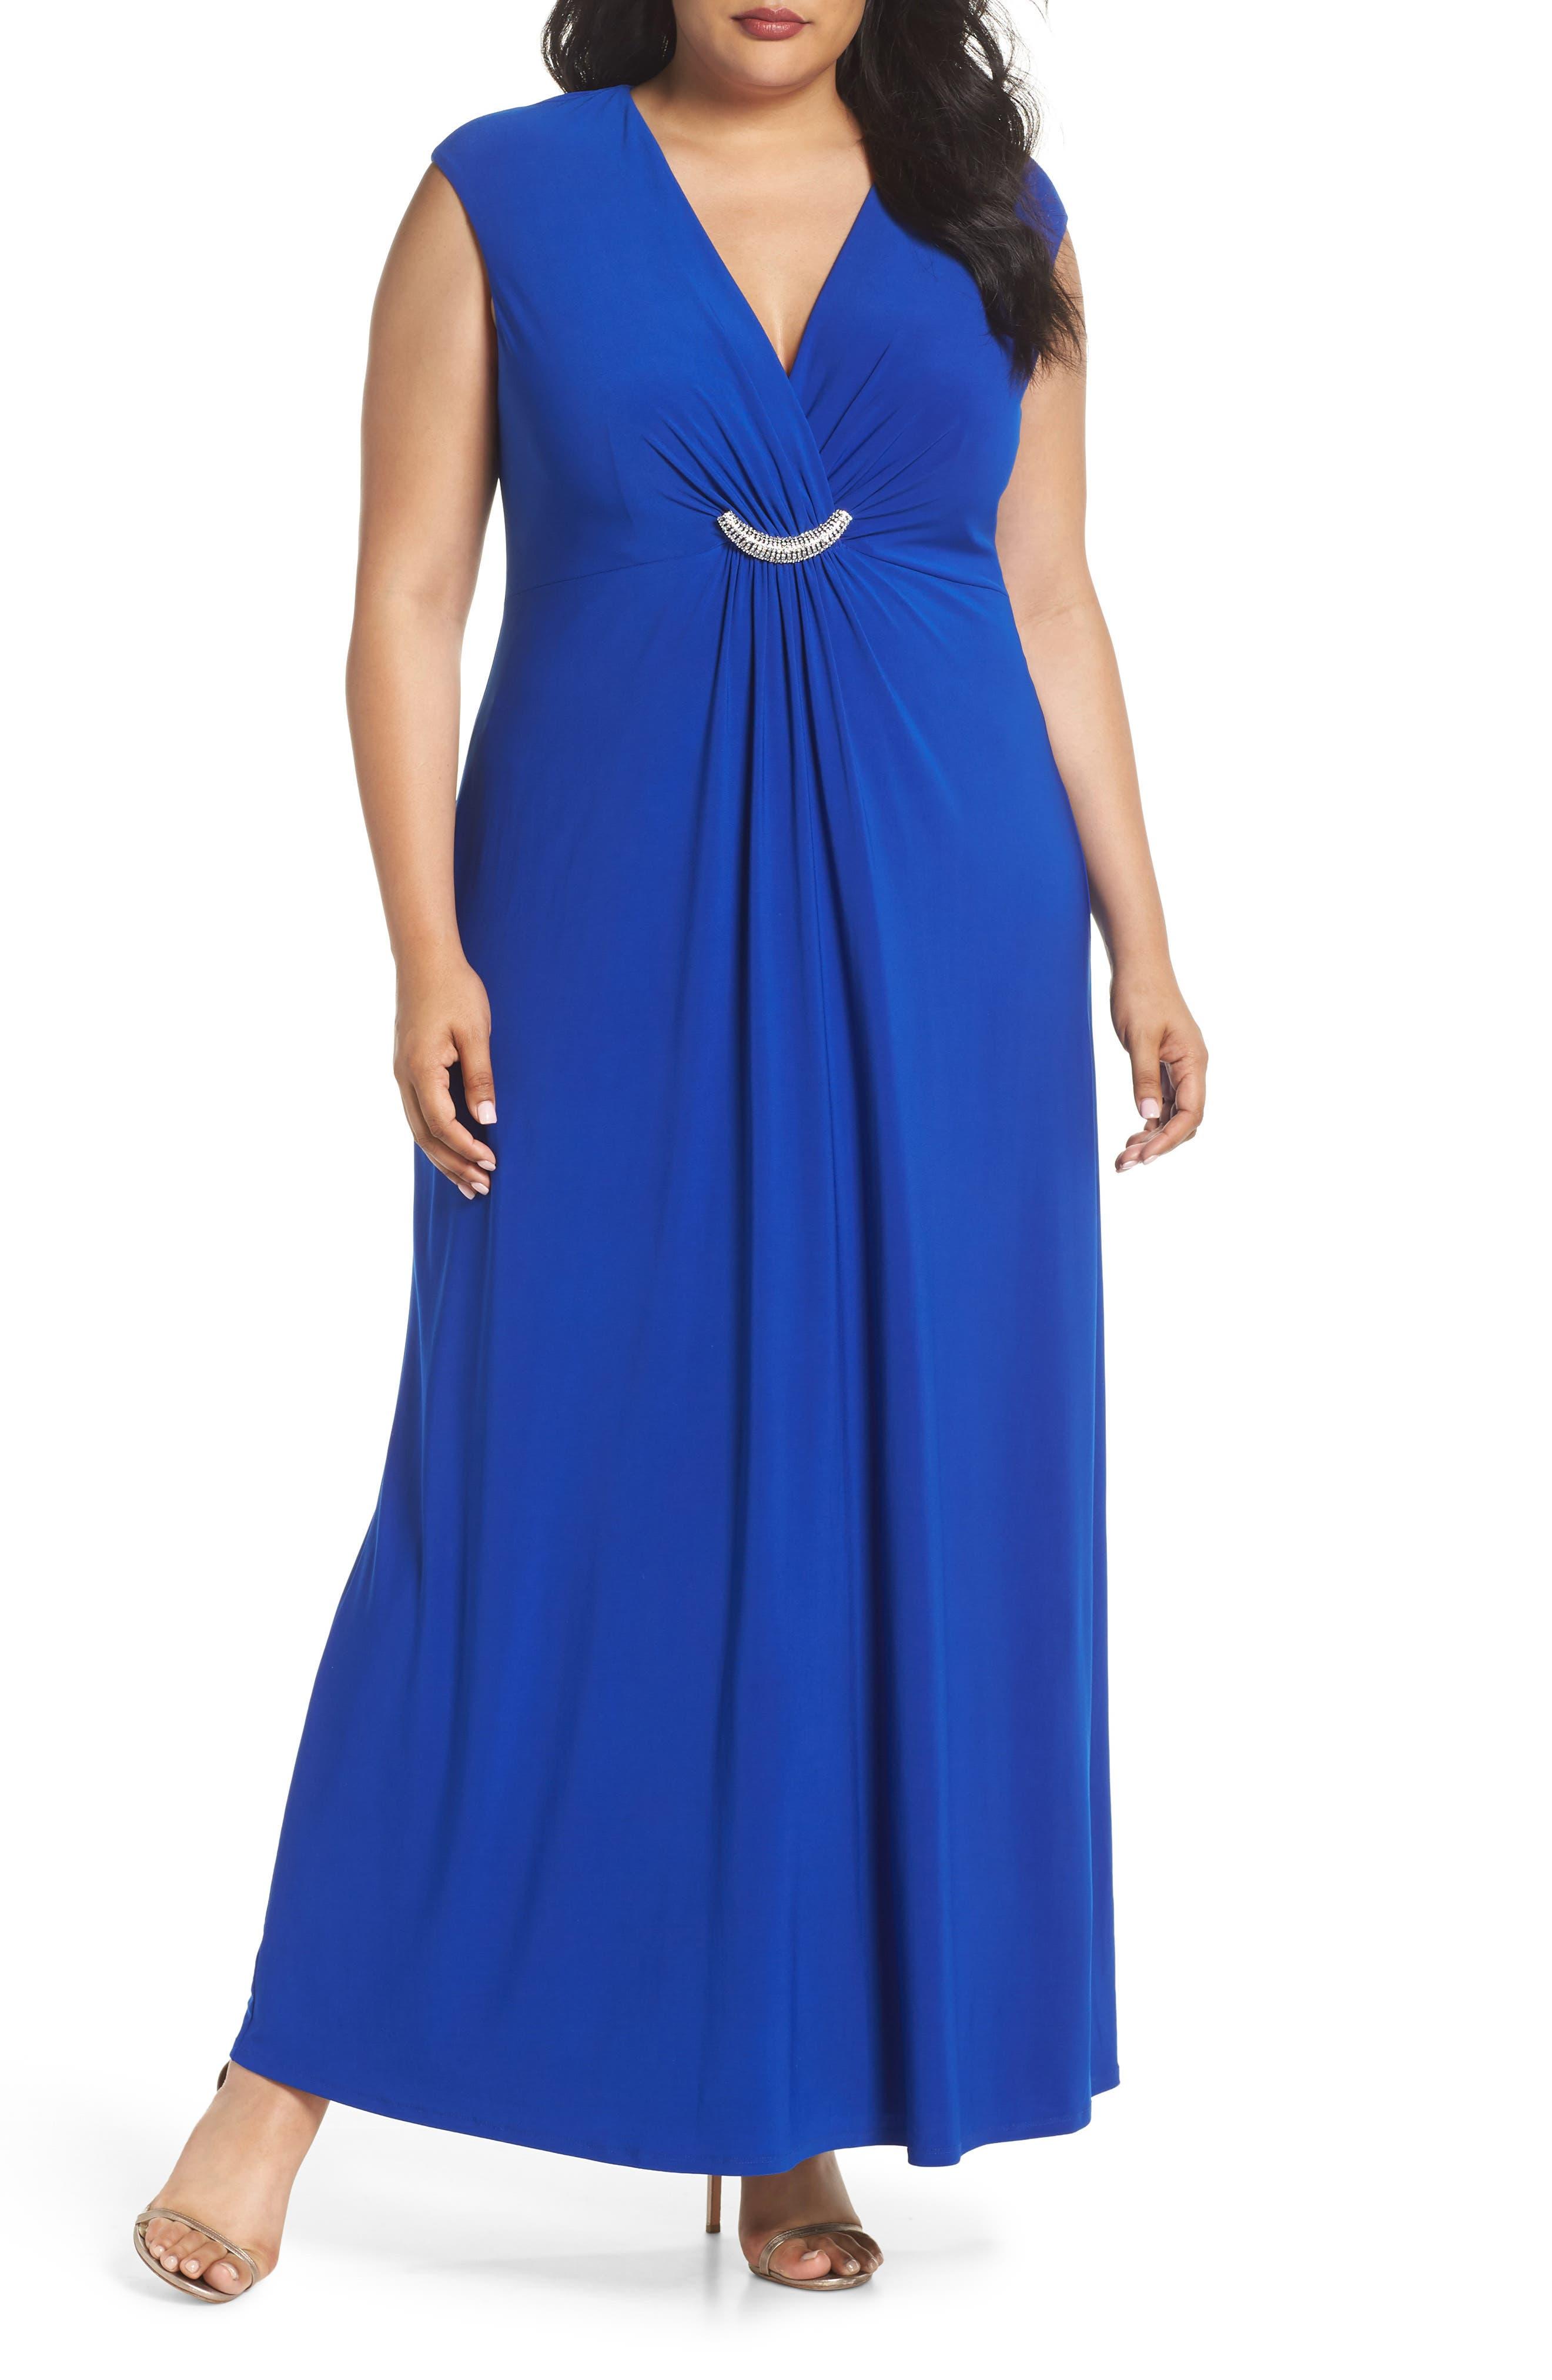 Embellished Surplice Dress,                             Main thumbnail 1, color,                             Cobalt